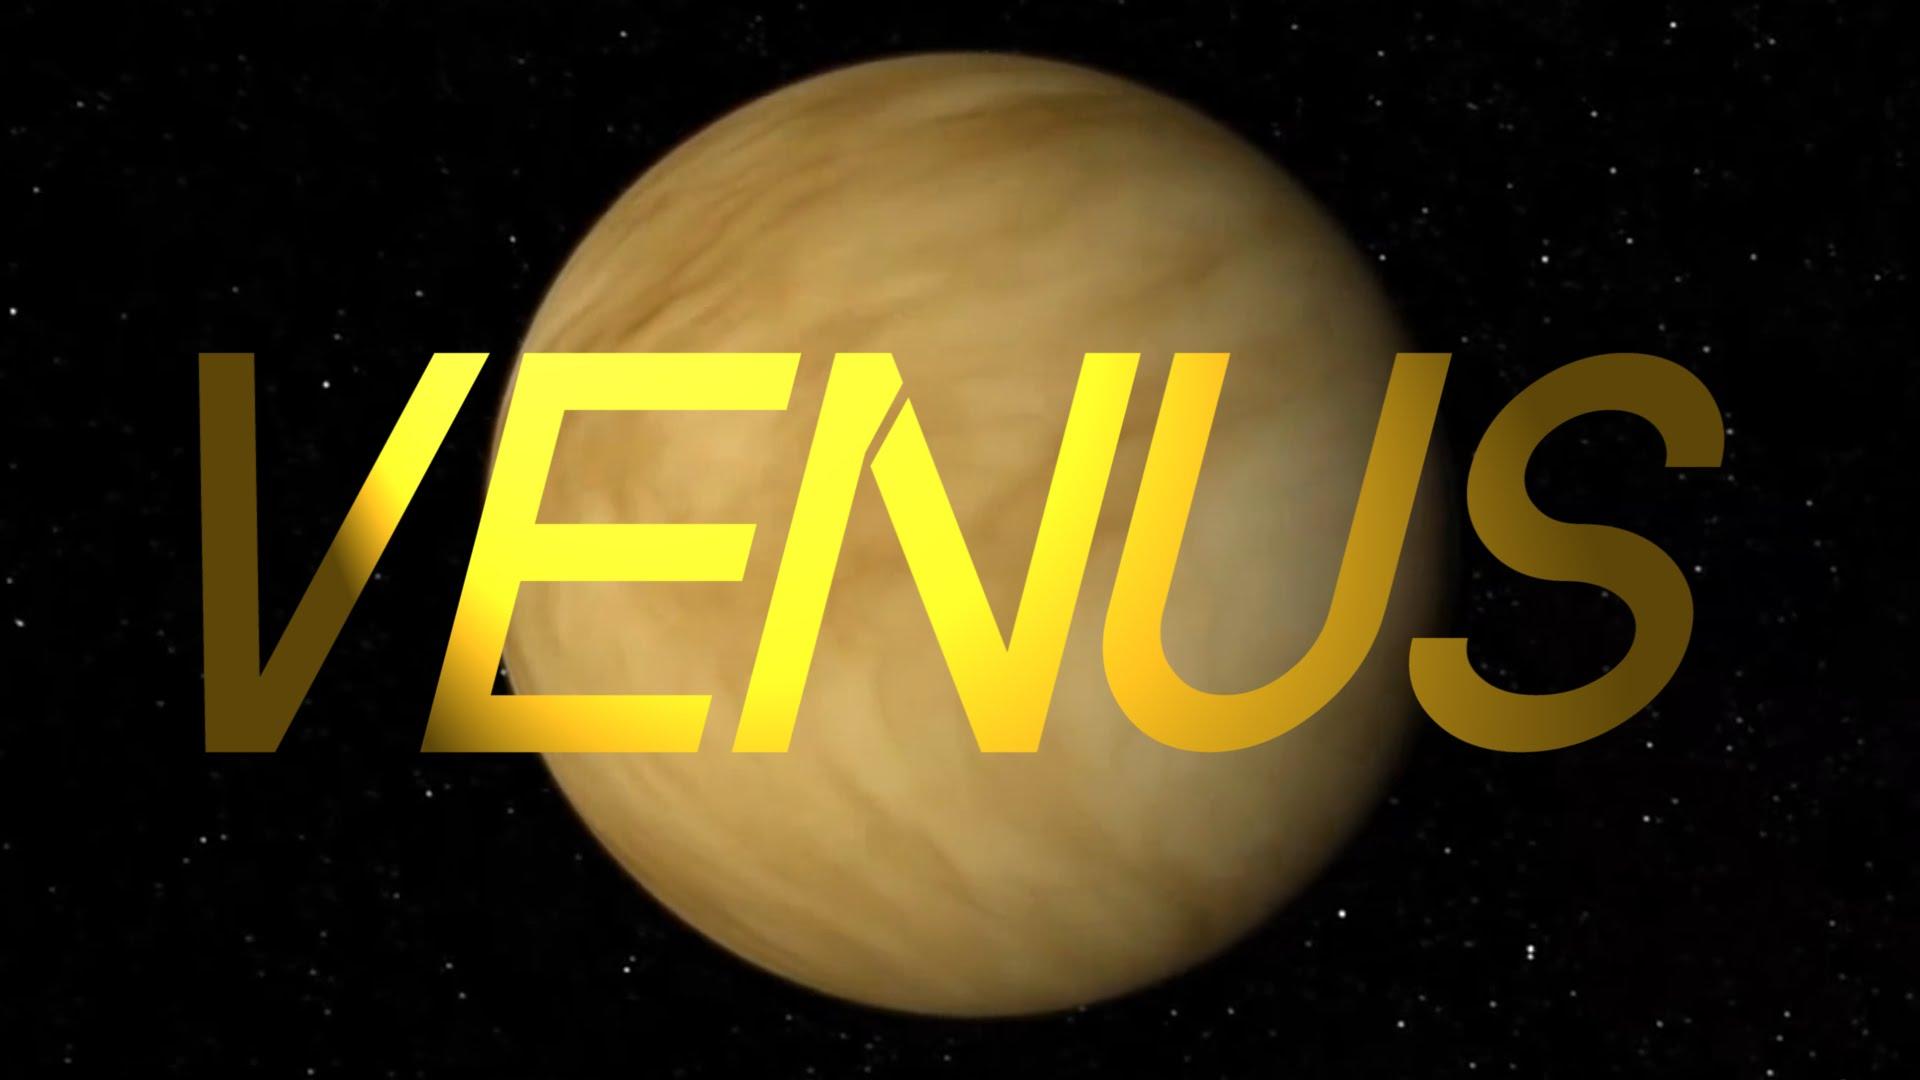 Venus Backgrounds